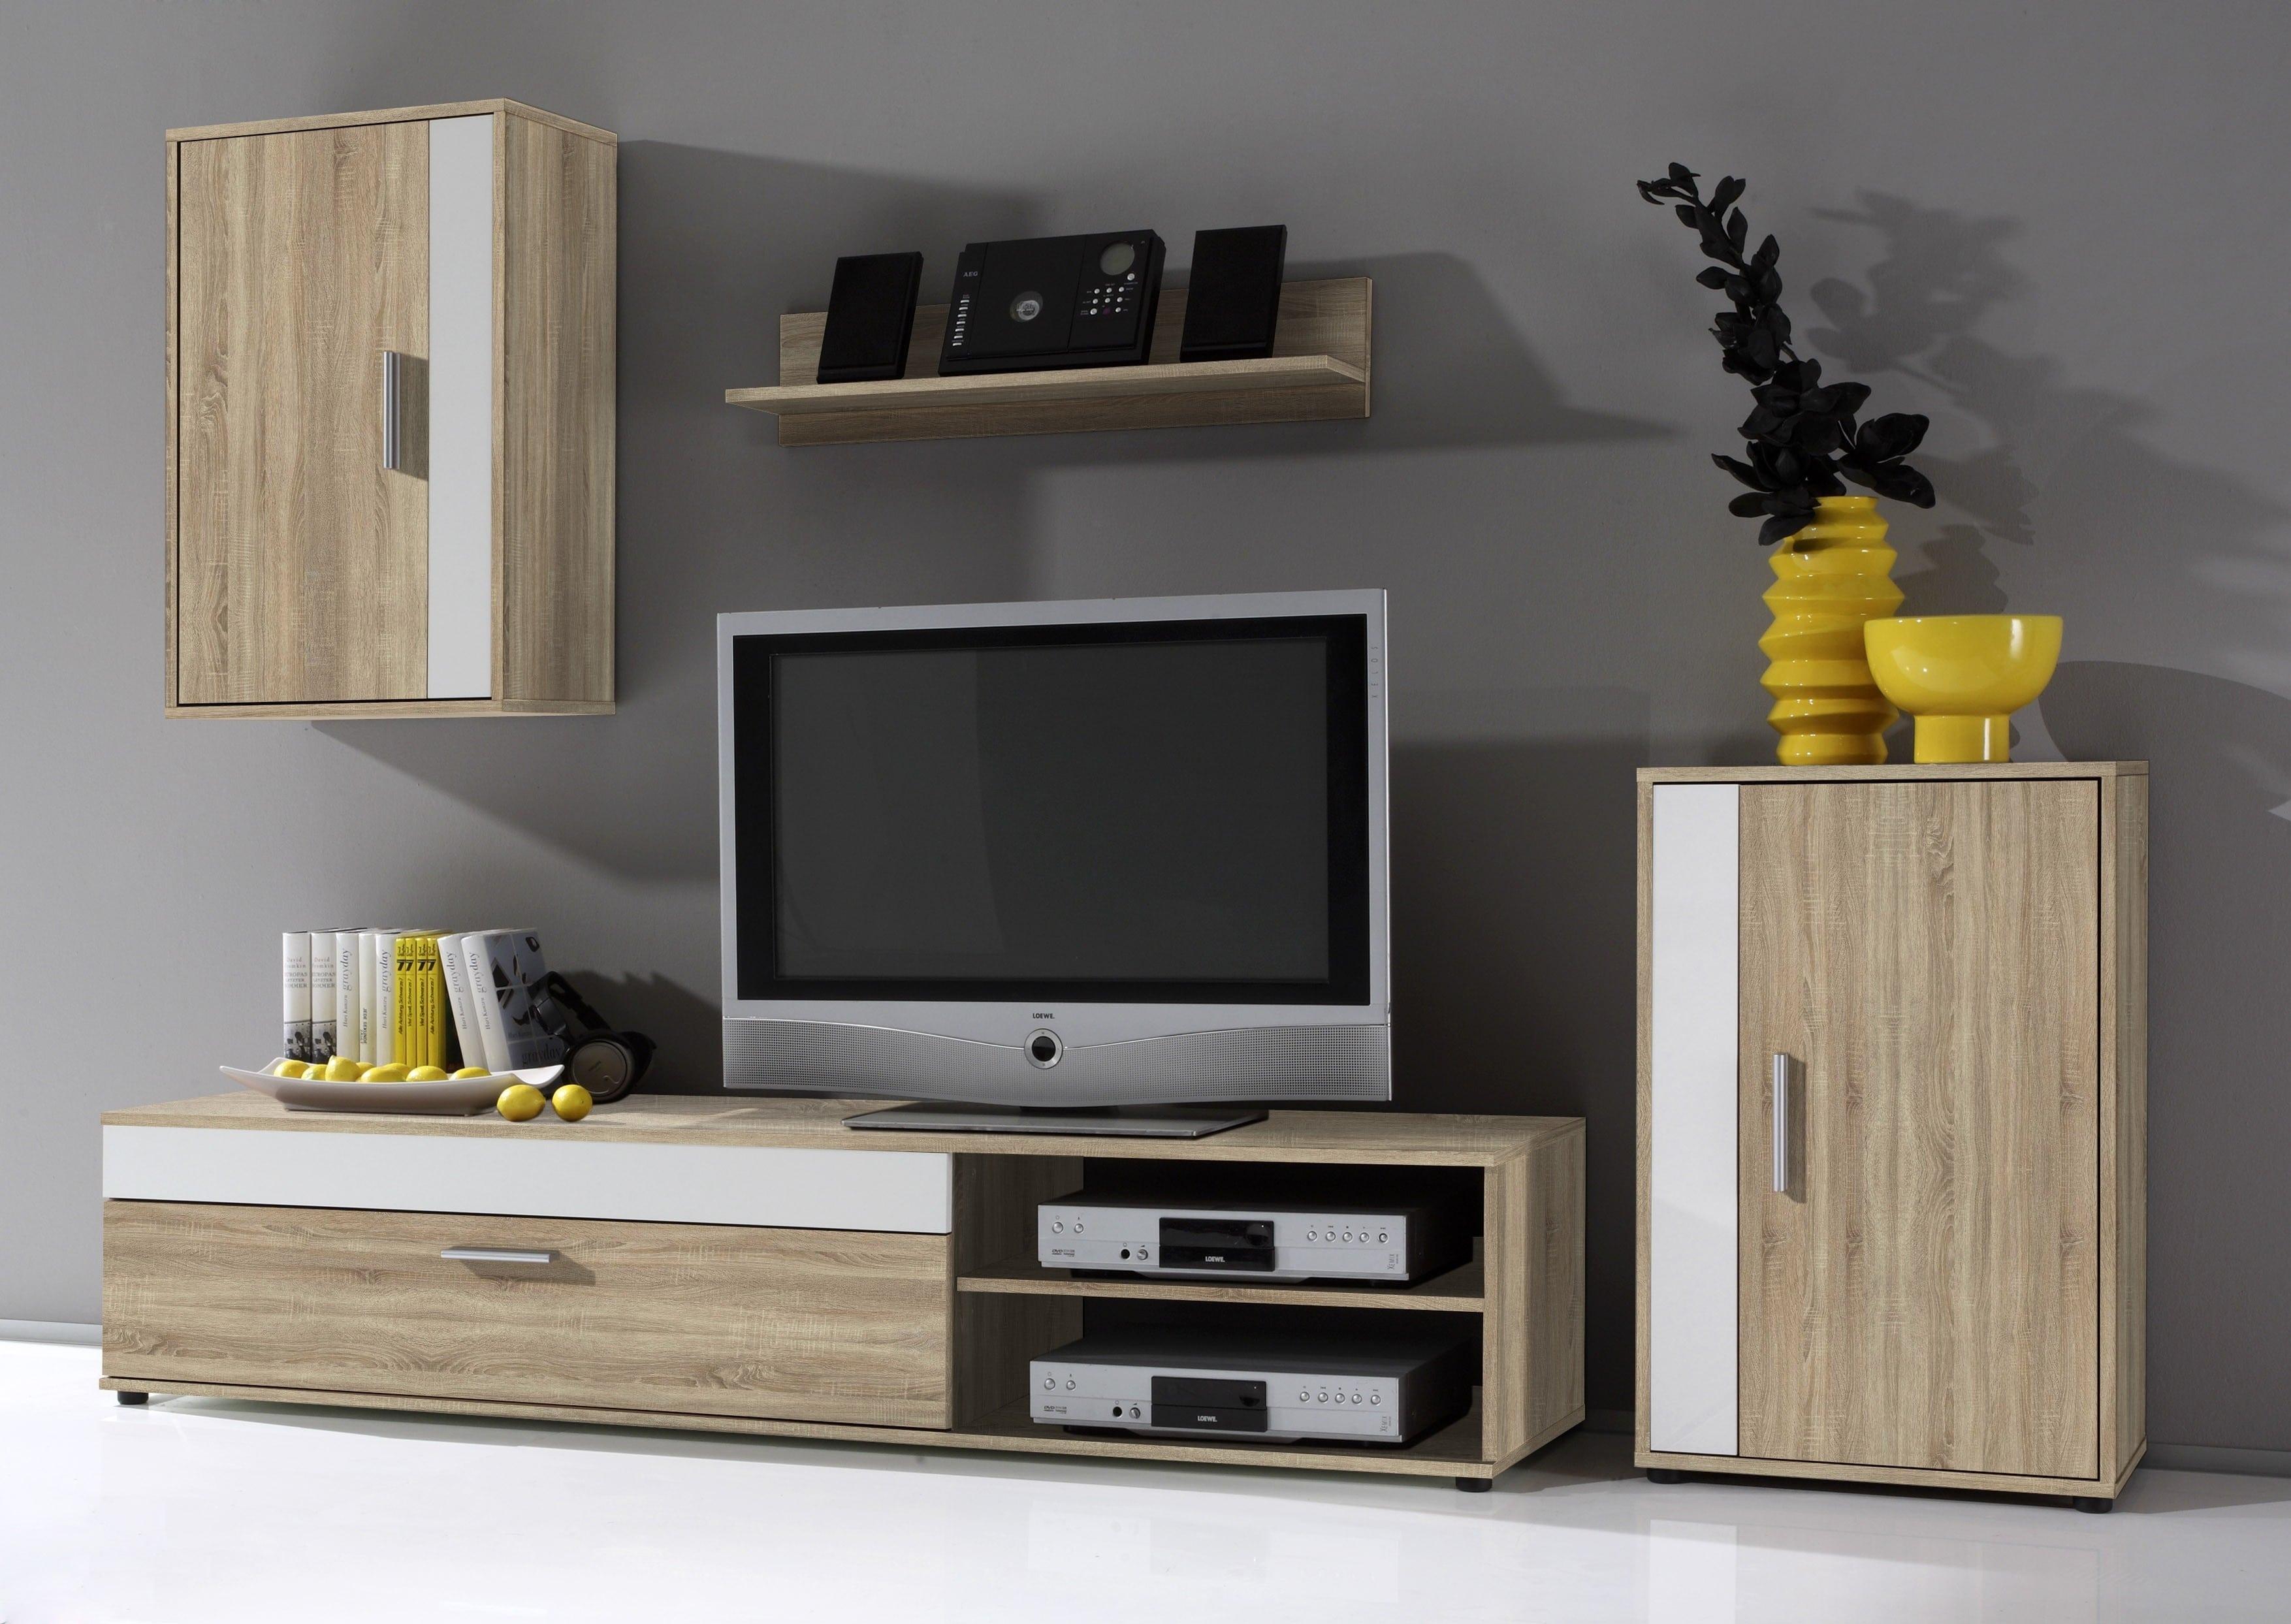 pareti attrezzate e mobili tv - avantishop - Soggiorno Pareti Attrezzate 2